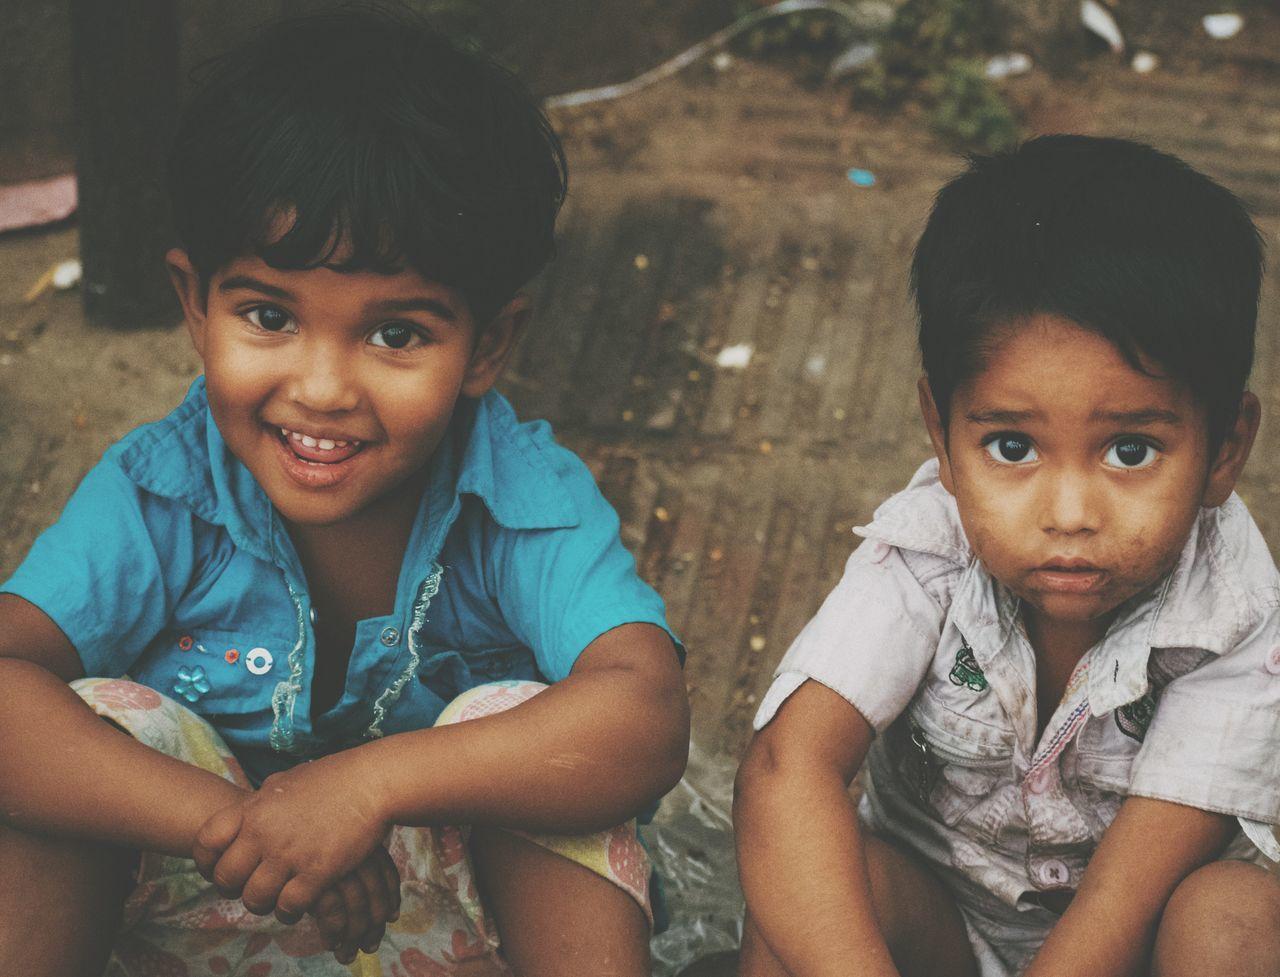 Loved their innocence! Kids Sitting Poor  Poor Children Streetphotography Street Childhood Close-up Tones Innocence Innocent Cute Roadside Dhaka, Bangladesh Dhaka